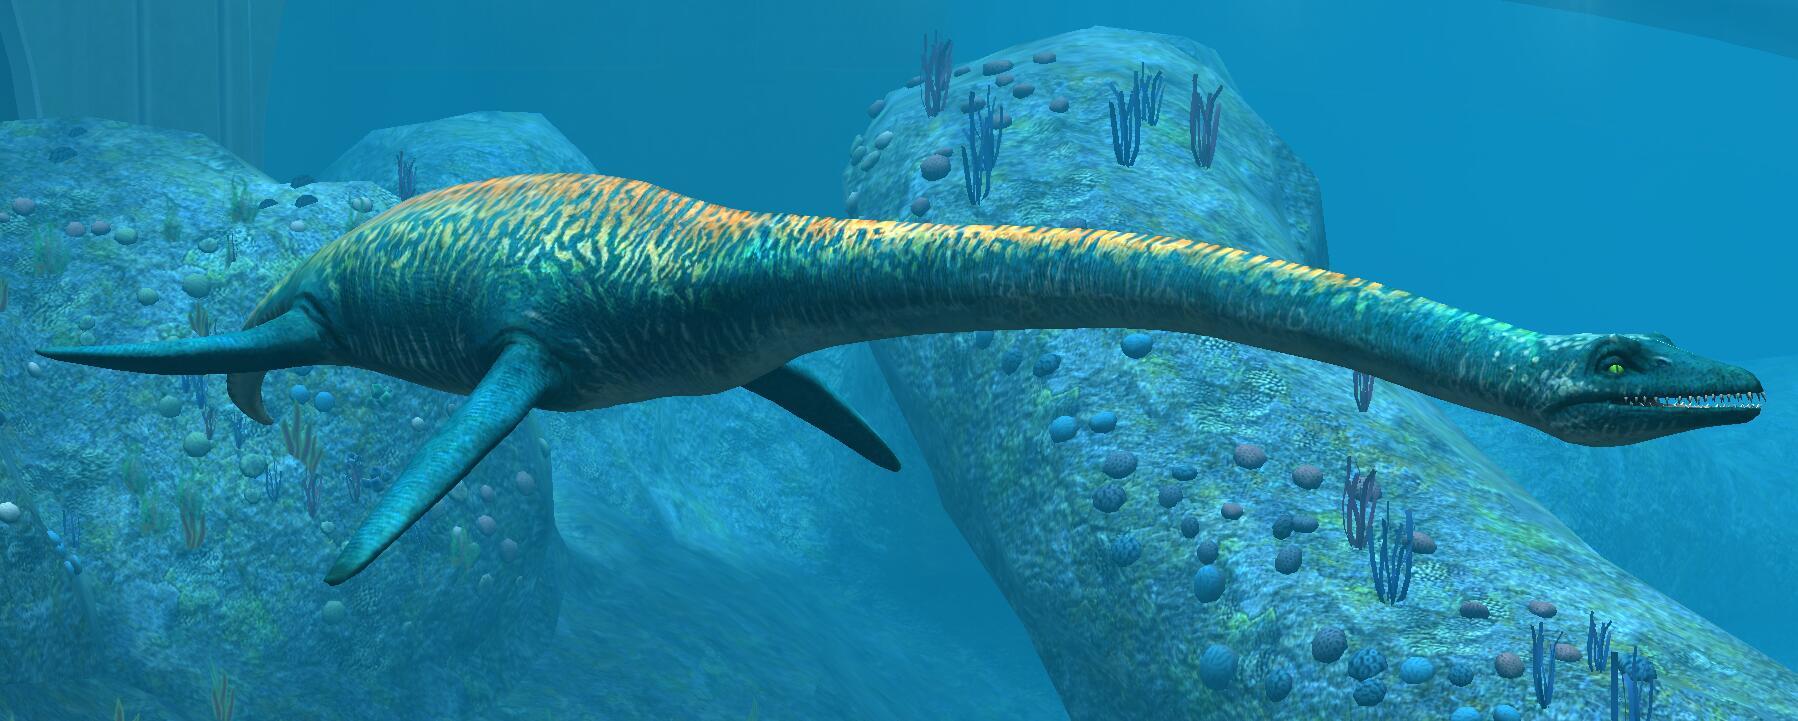 Картинки плезиозавра динозавра